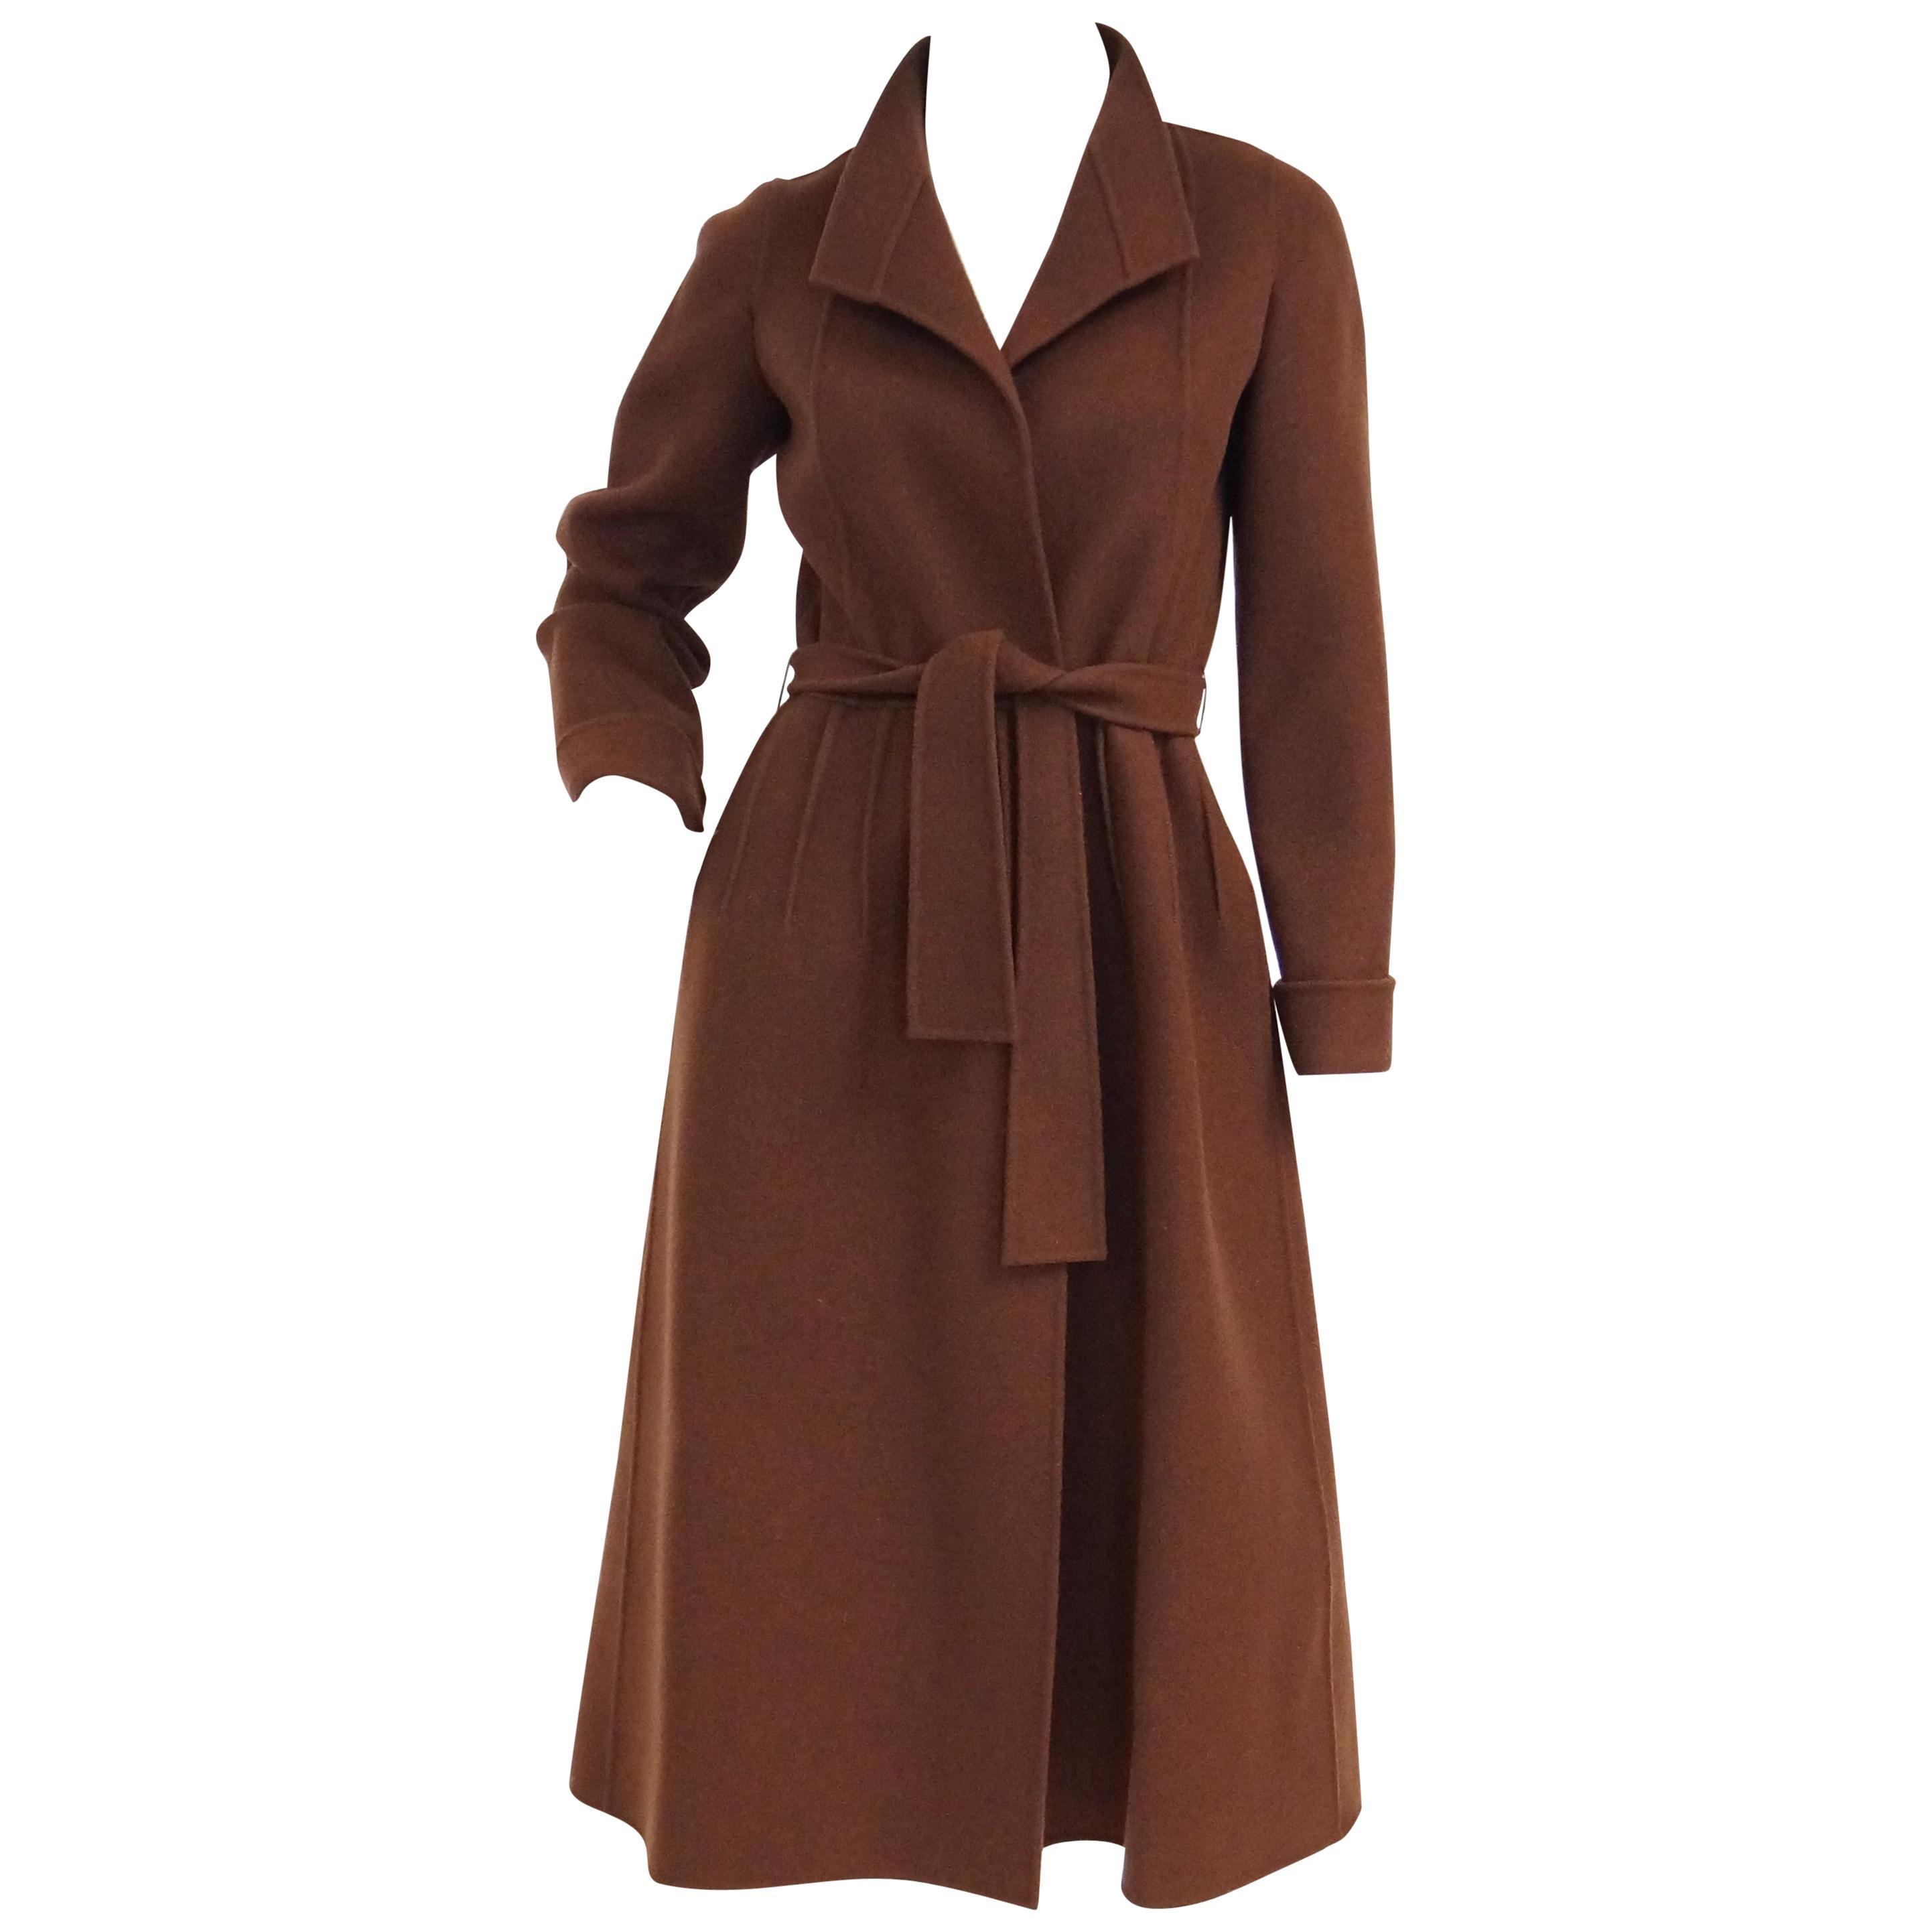 1970s Andre Laug Audrey Brown Wool Wrap Coat 36